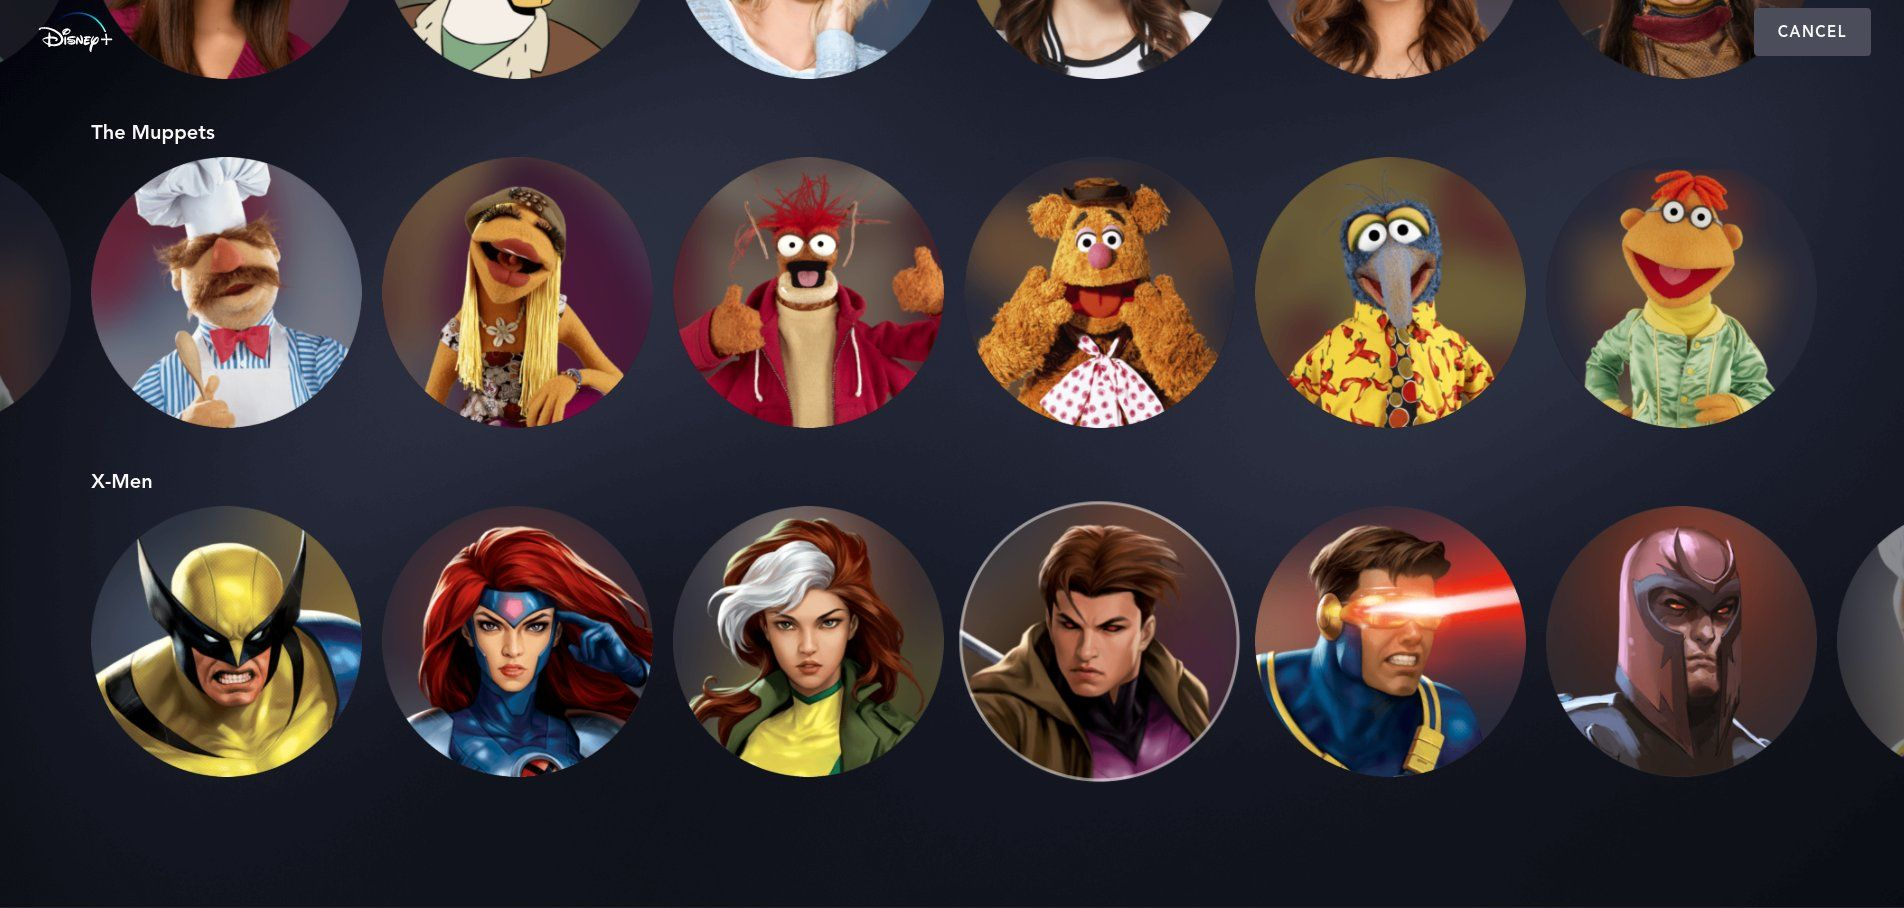 Disney+ avatars